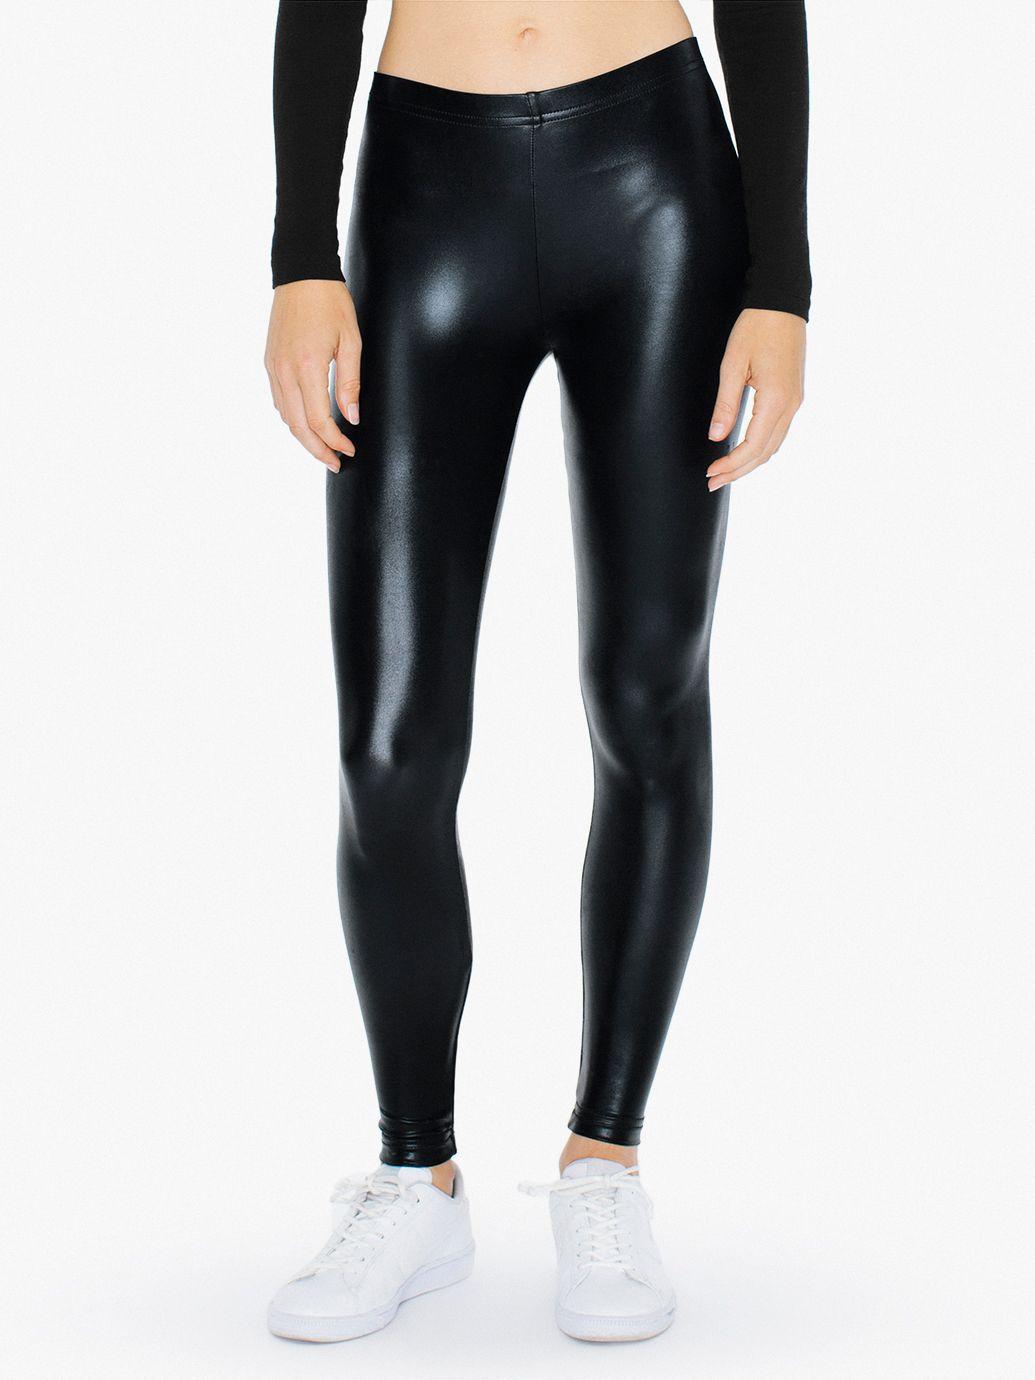 metallic legging american apparel